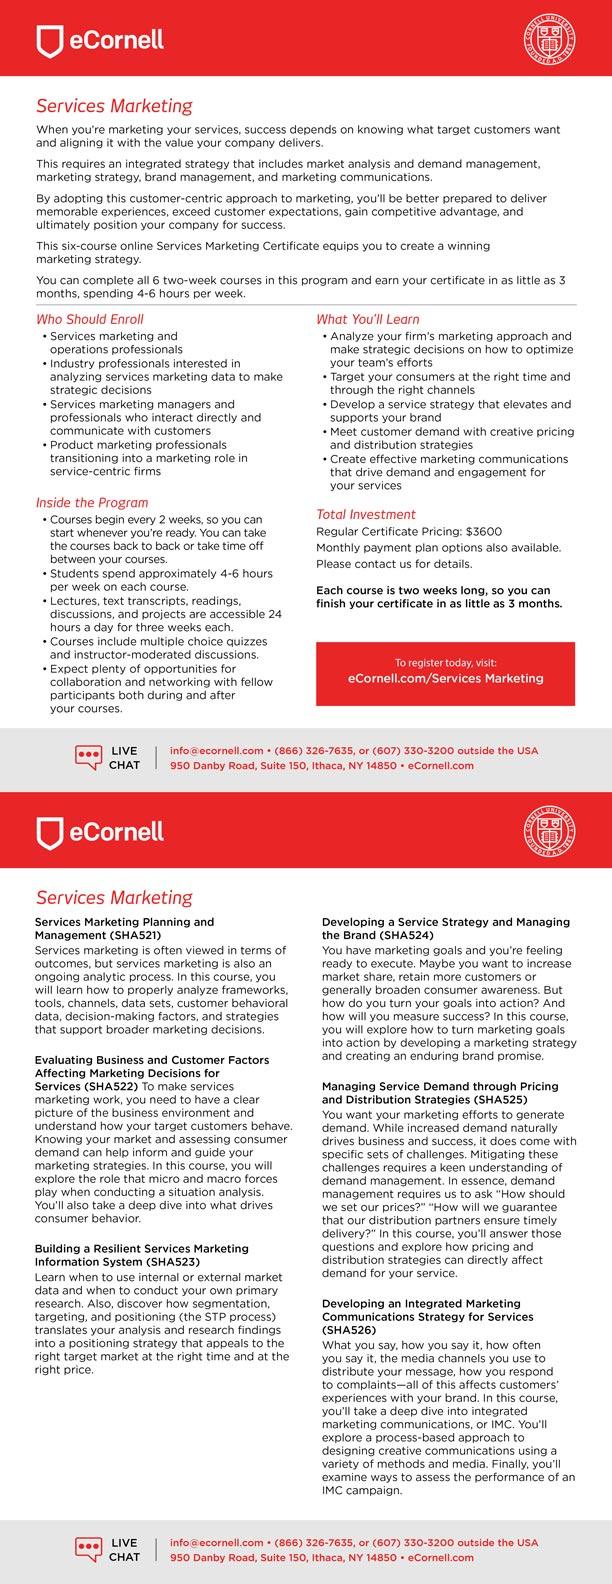 Services Marketing Flyer